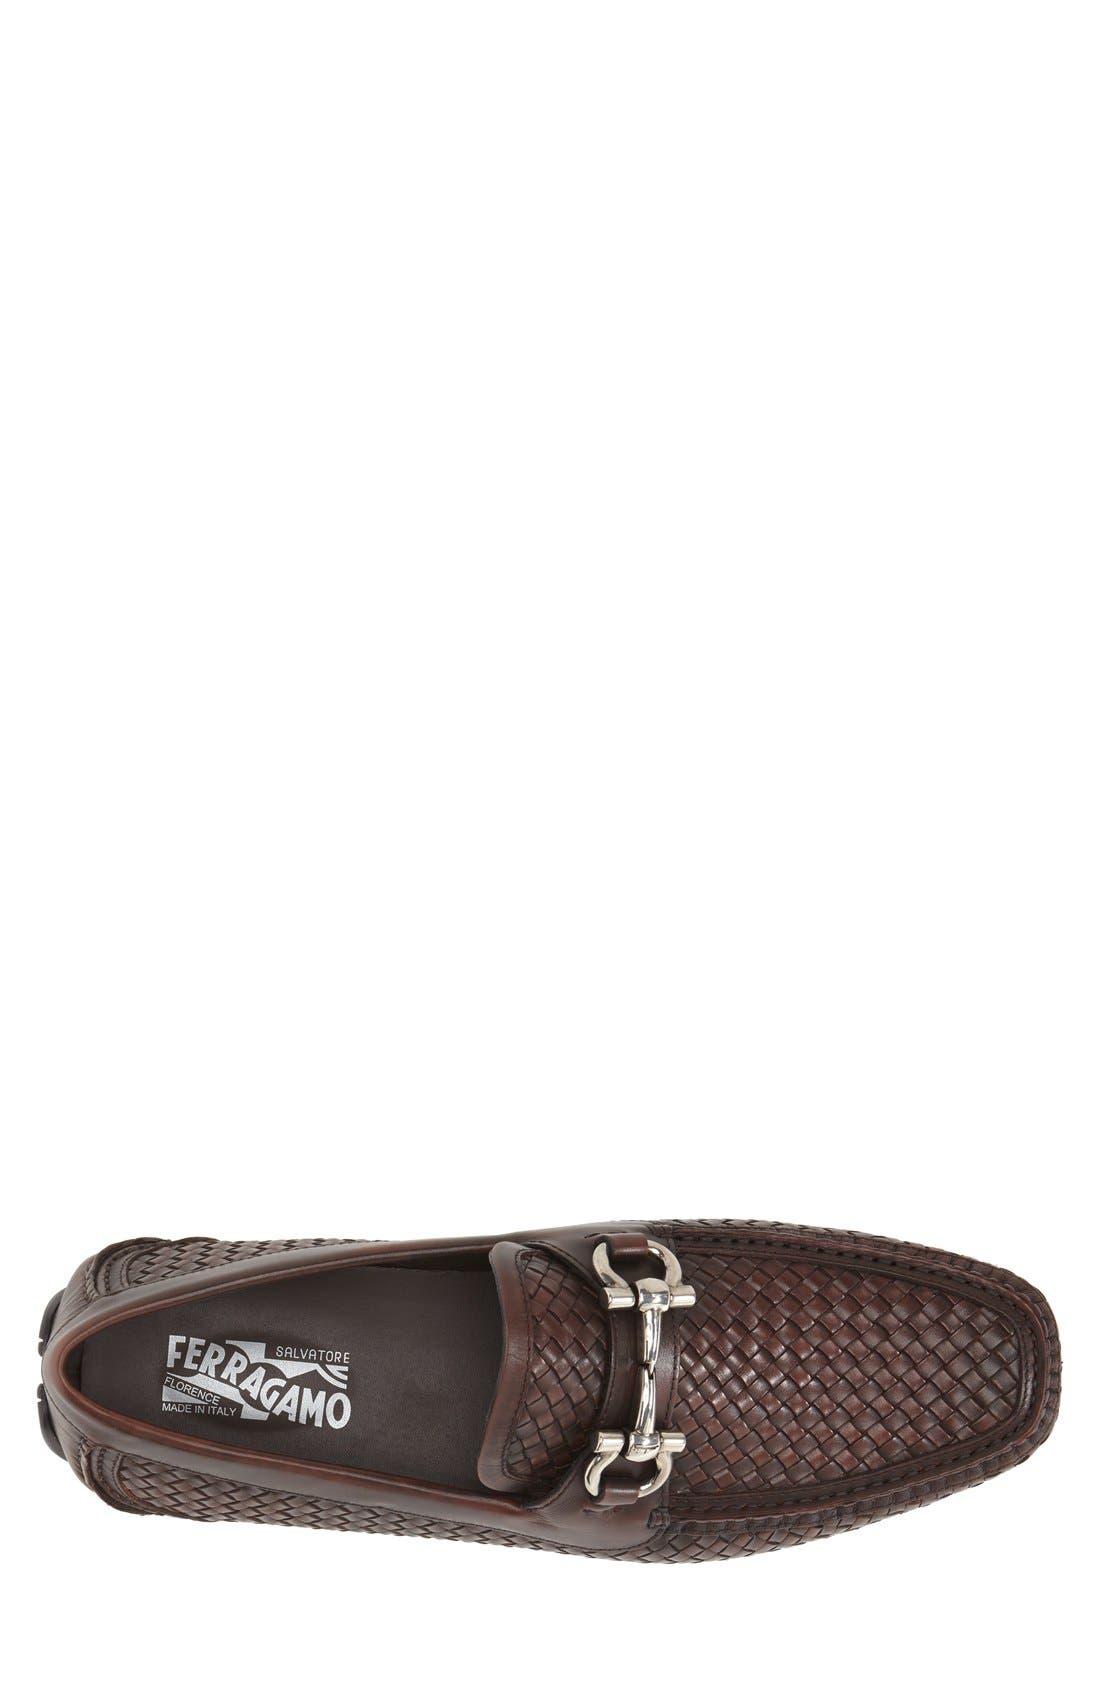 'Parigi' Woven Bit Loafer,                             Alternate thumbnail 3, color,                             Brown Hen/ T Moro Leather